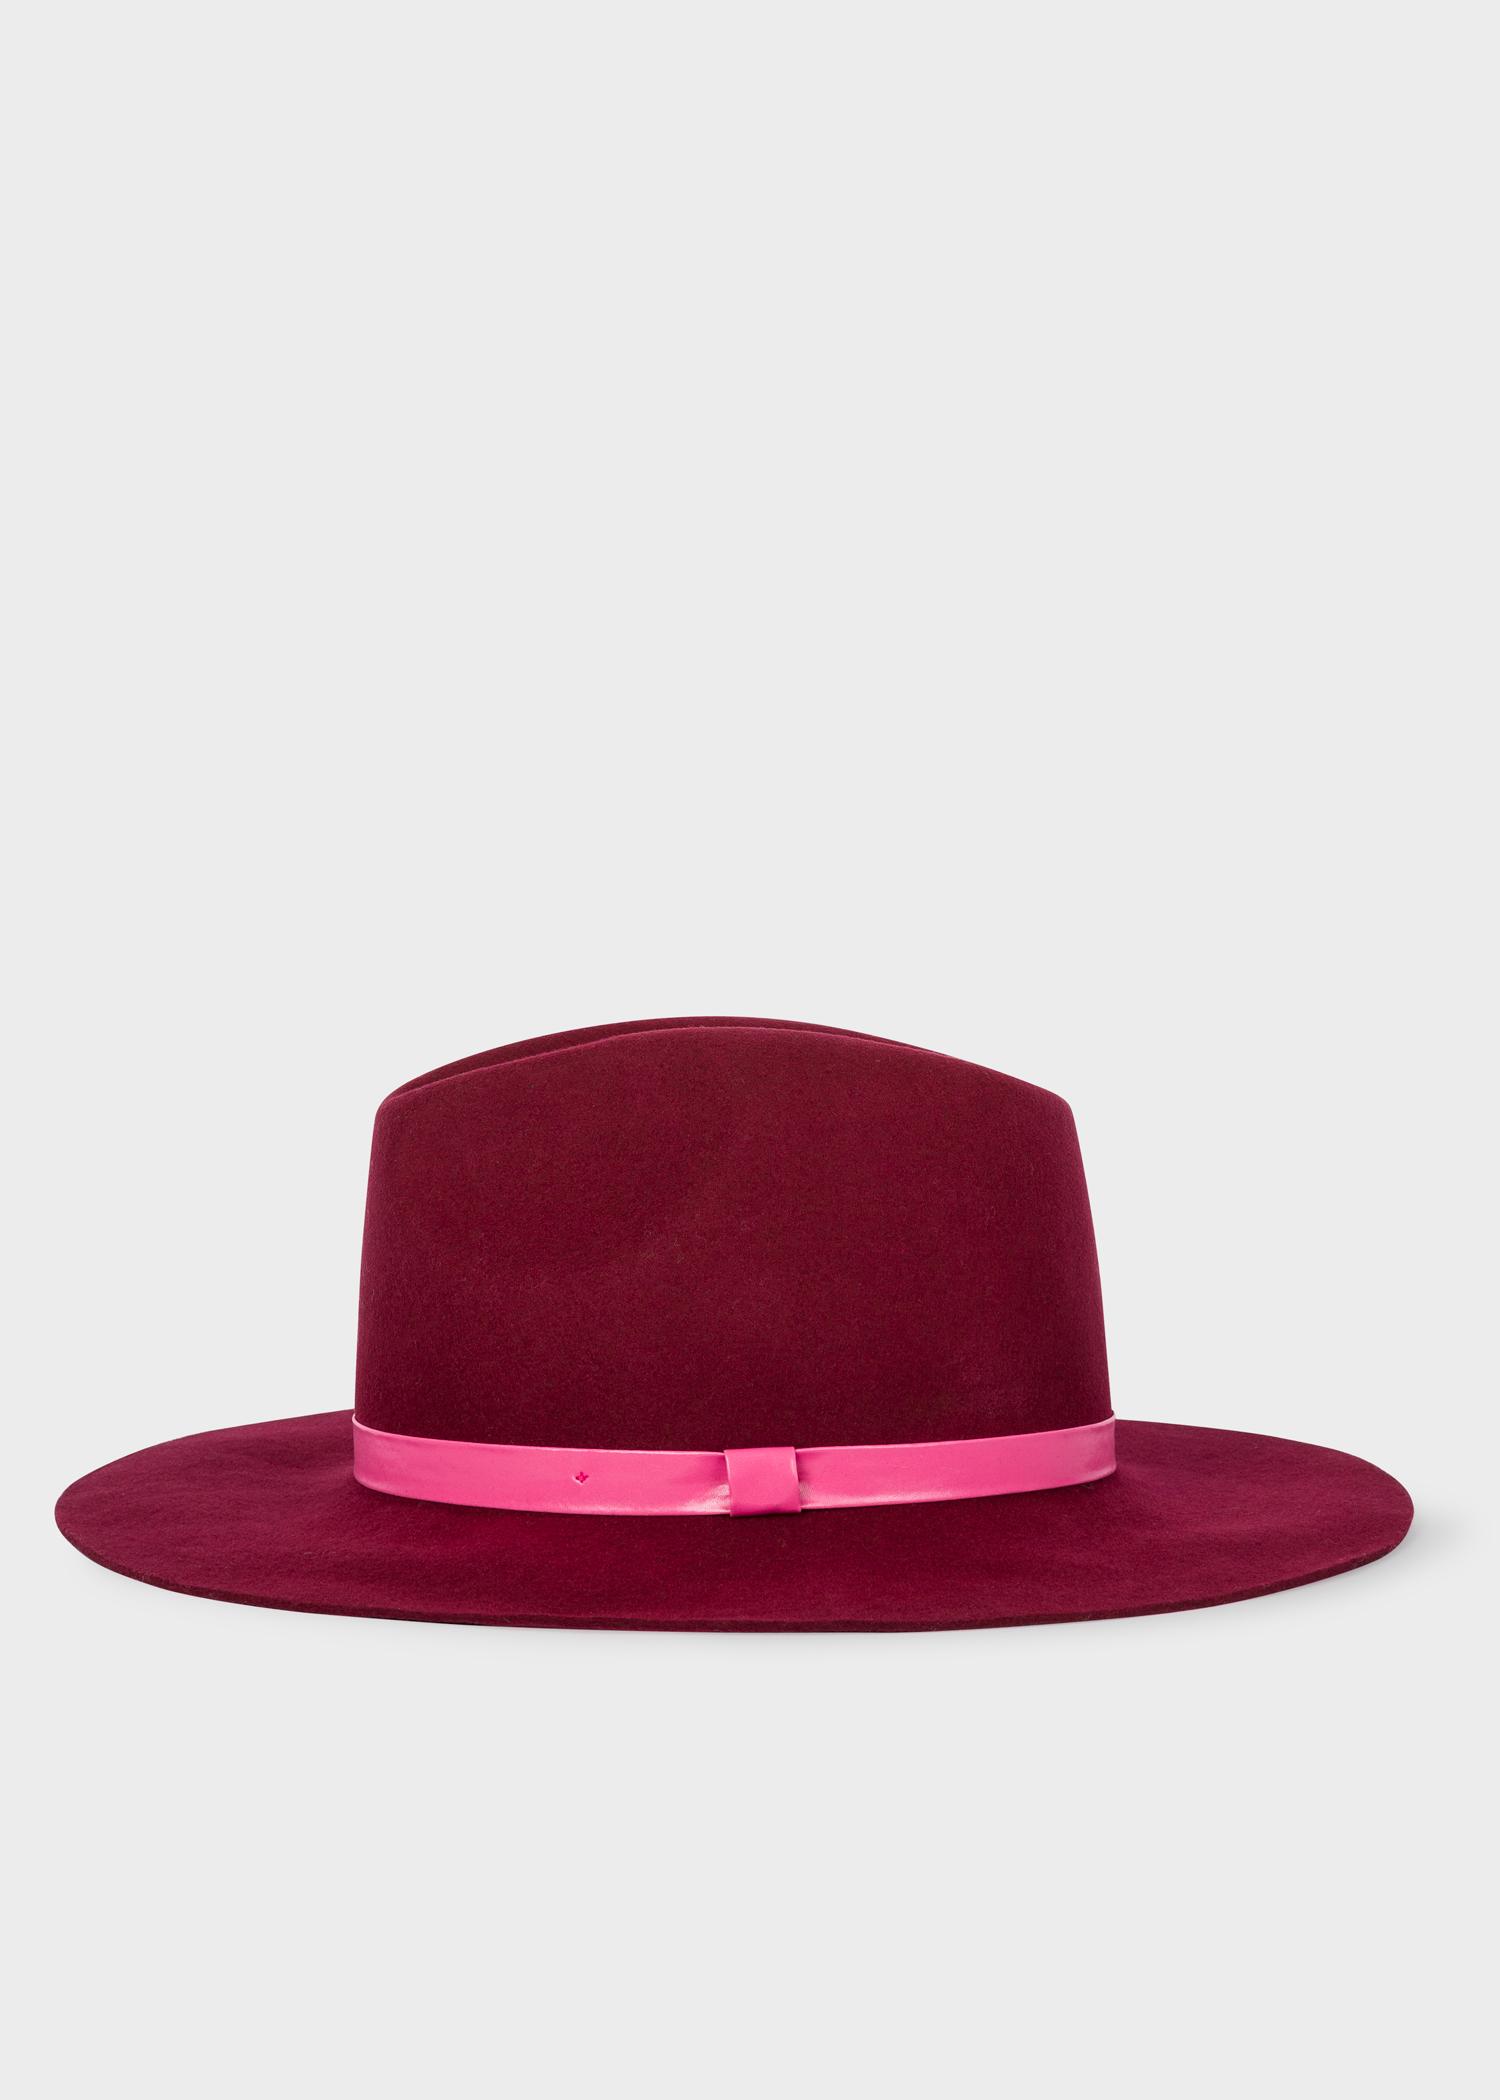 Women s Burgundy Wool Fedora Hat With  Swirl  Lining - Paul Smith Europe d373c7d96f2